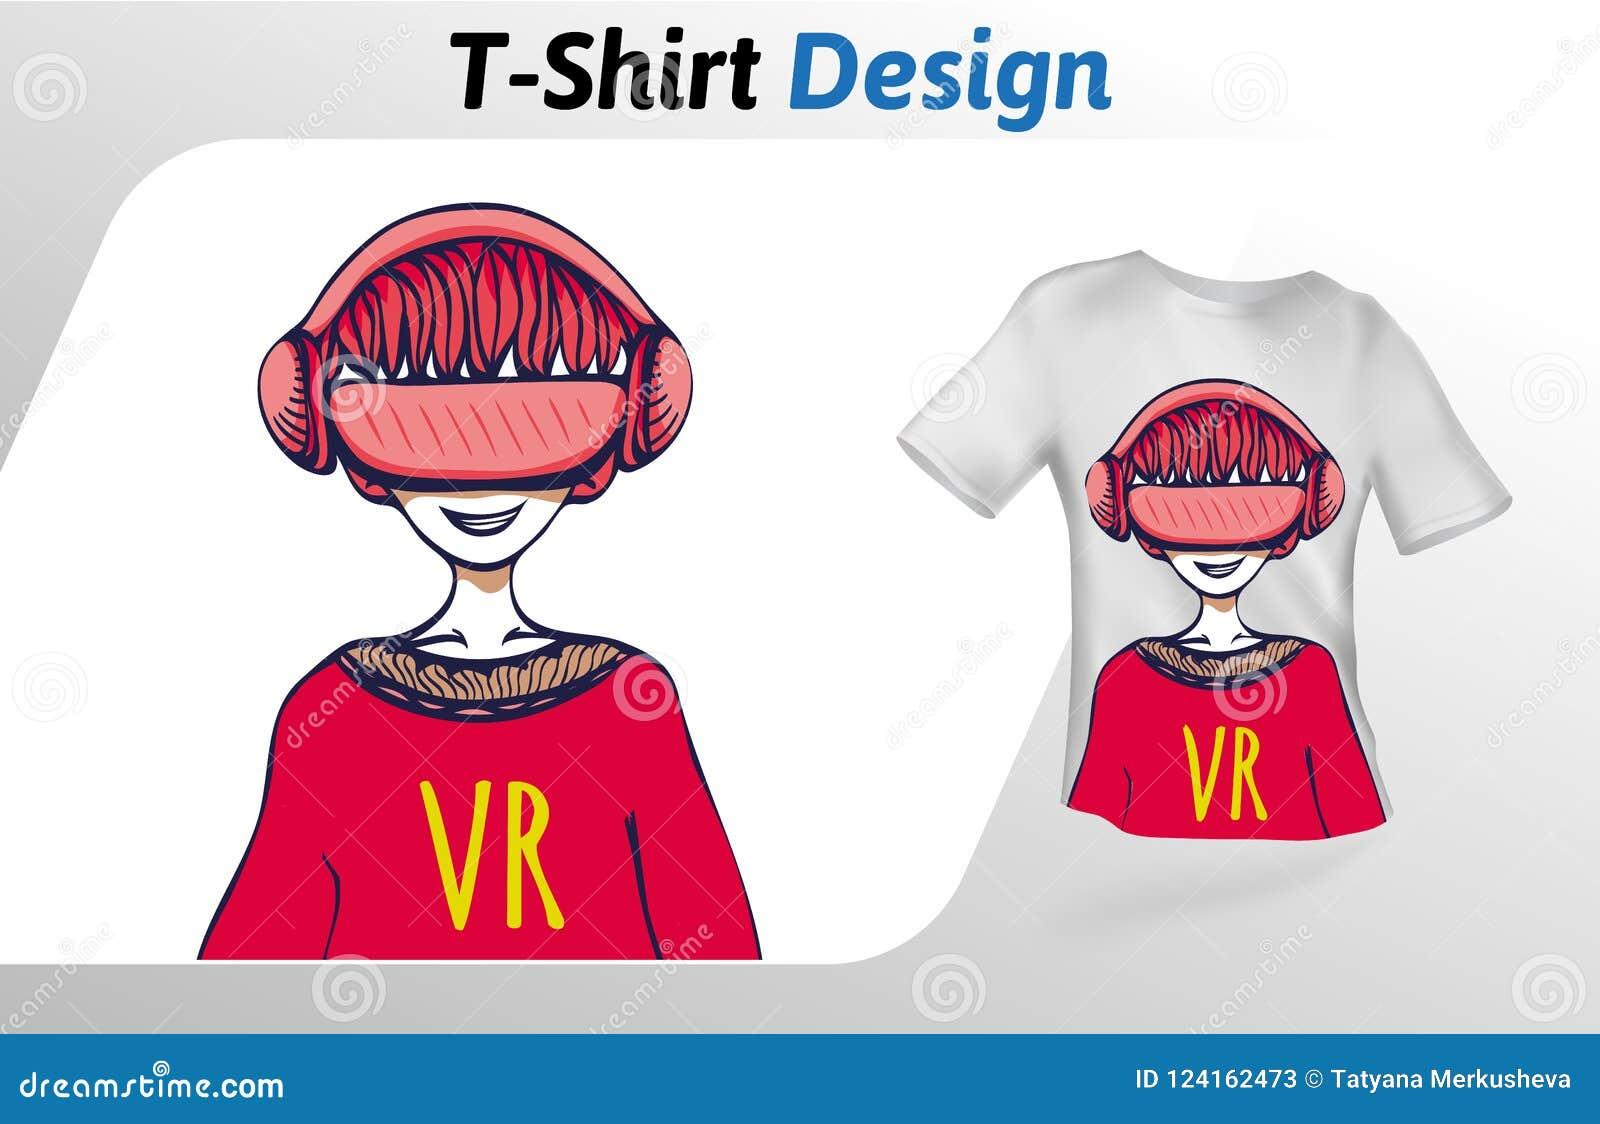 guy in vr headset having a good time t shirt print mock up t shirt